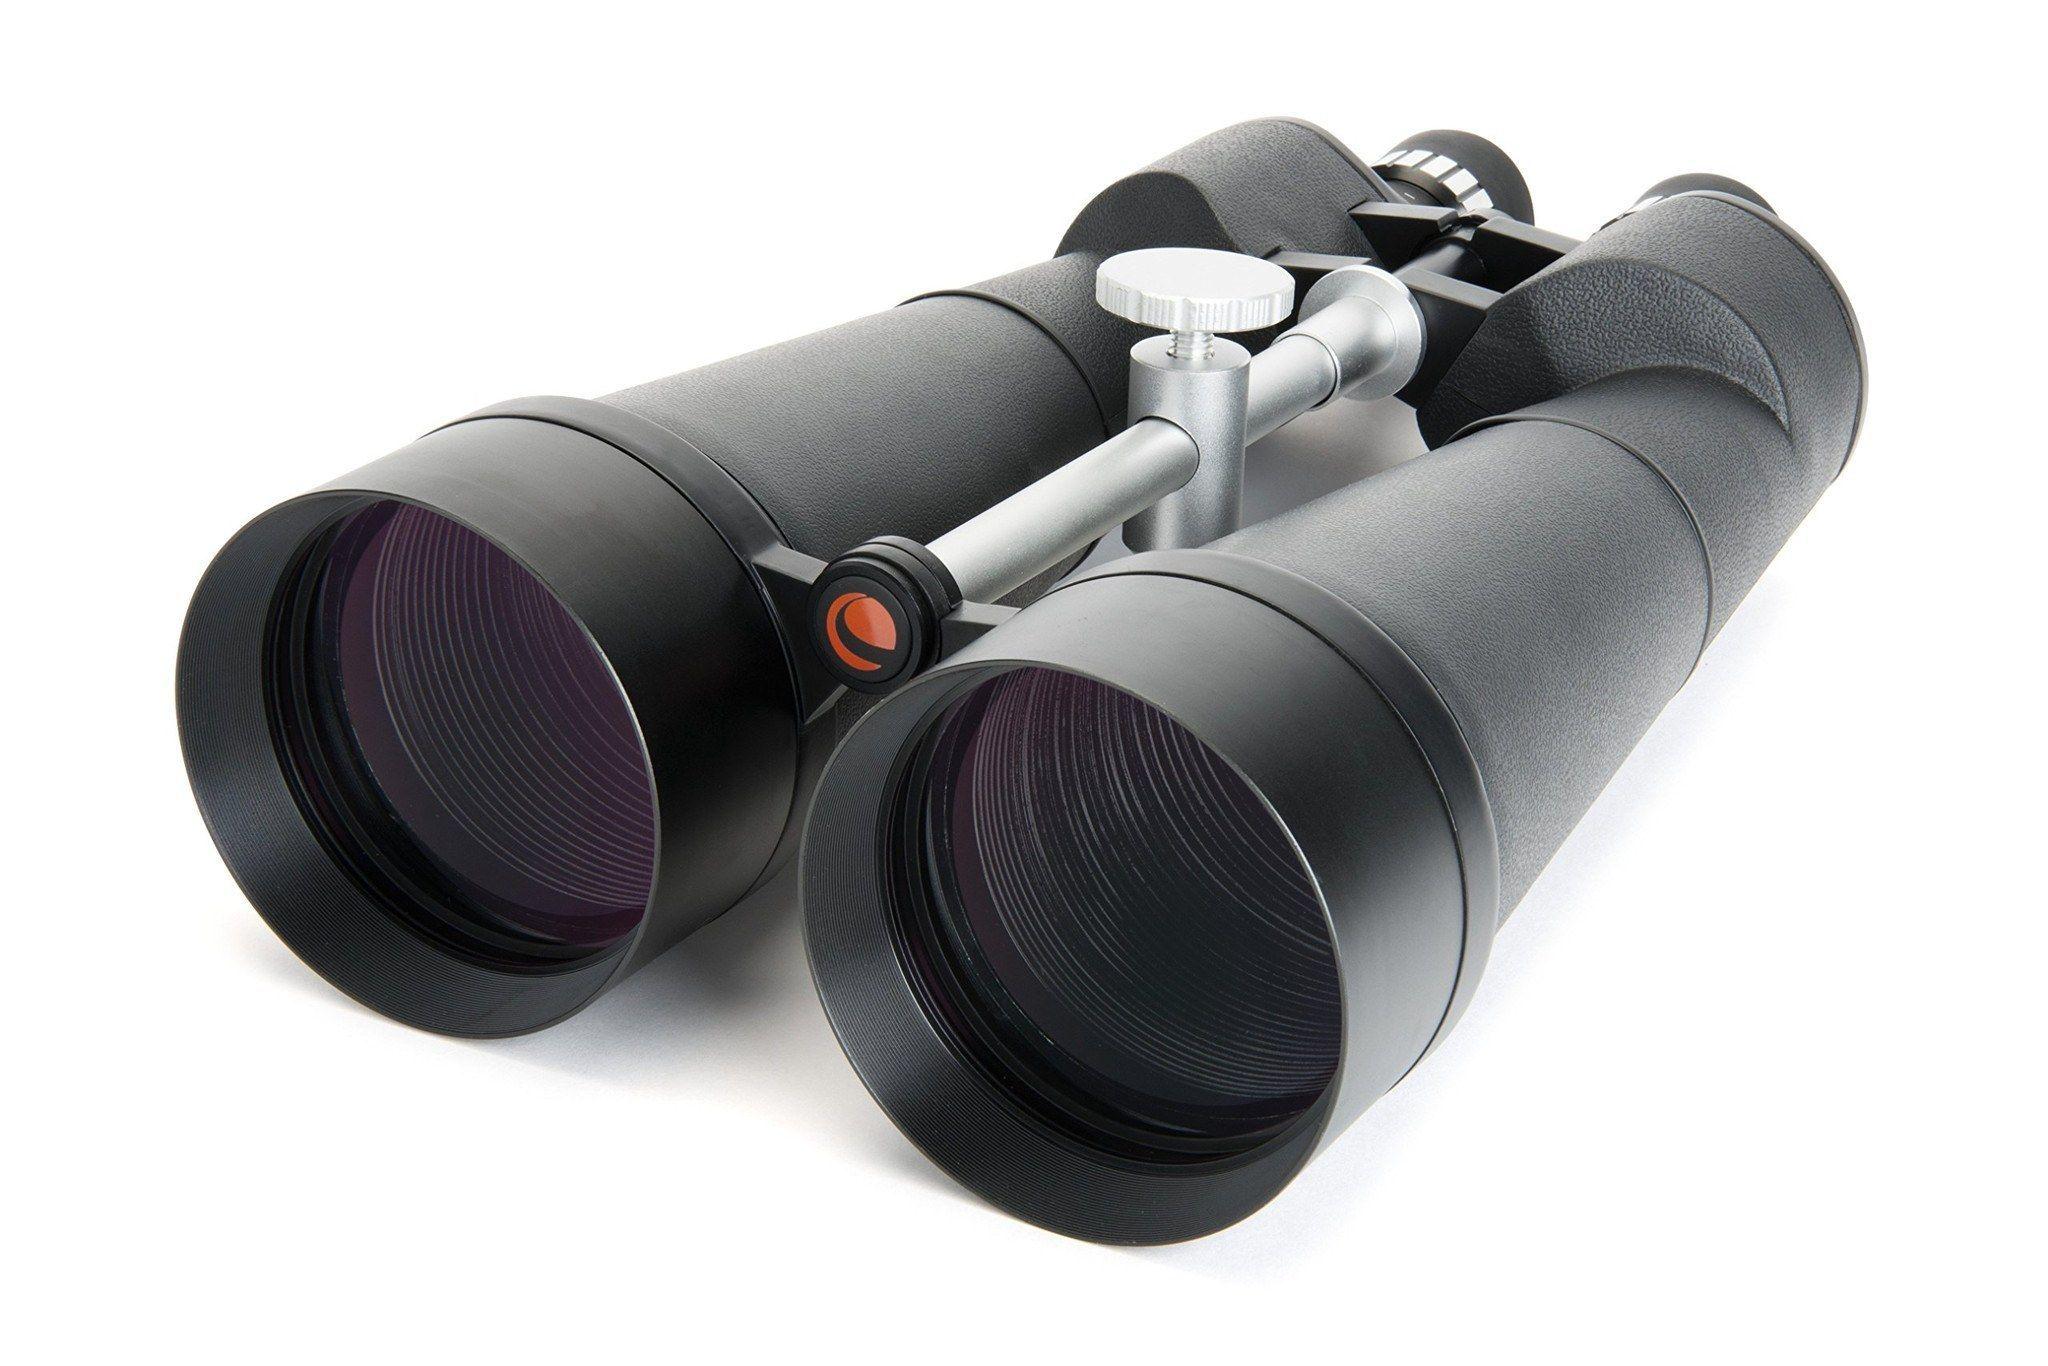 Astromart classifieds binoculars takahashi 22x60 binoculars with astromart classifieds binoculars takahashi 22x60 binoculars with case sale pending my astronomy and space pinterest binoculars geenschuldenfo Choice Image